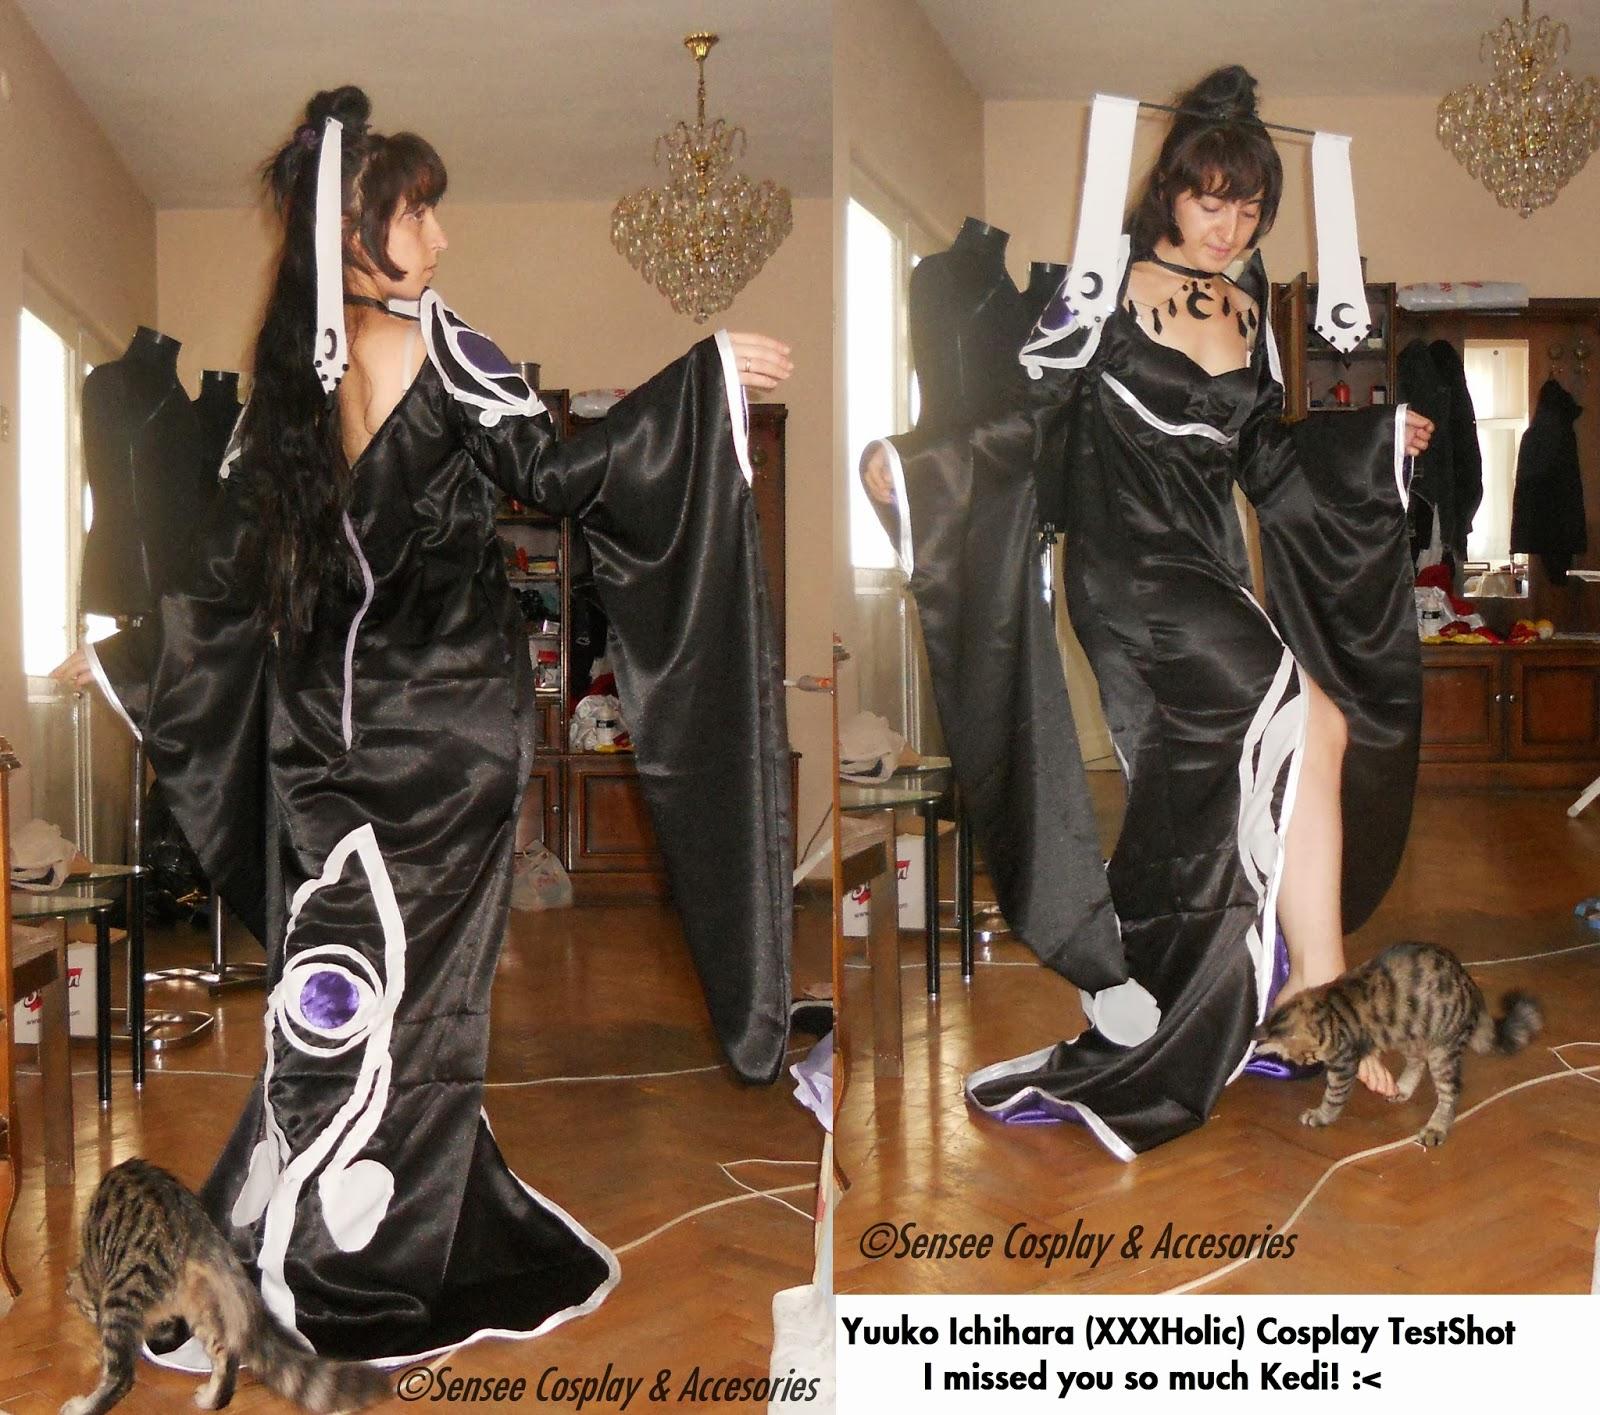 Xxx holic costumes — photo 14